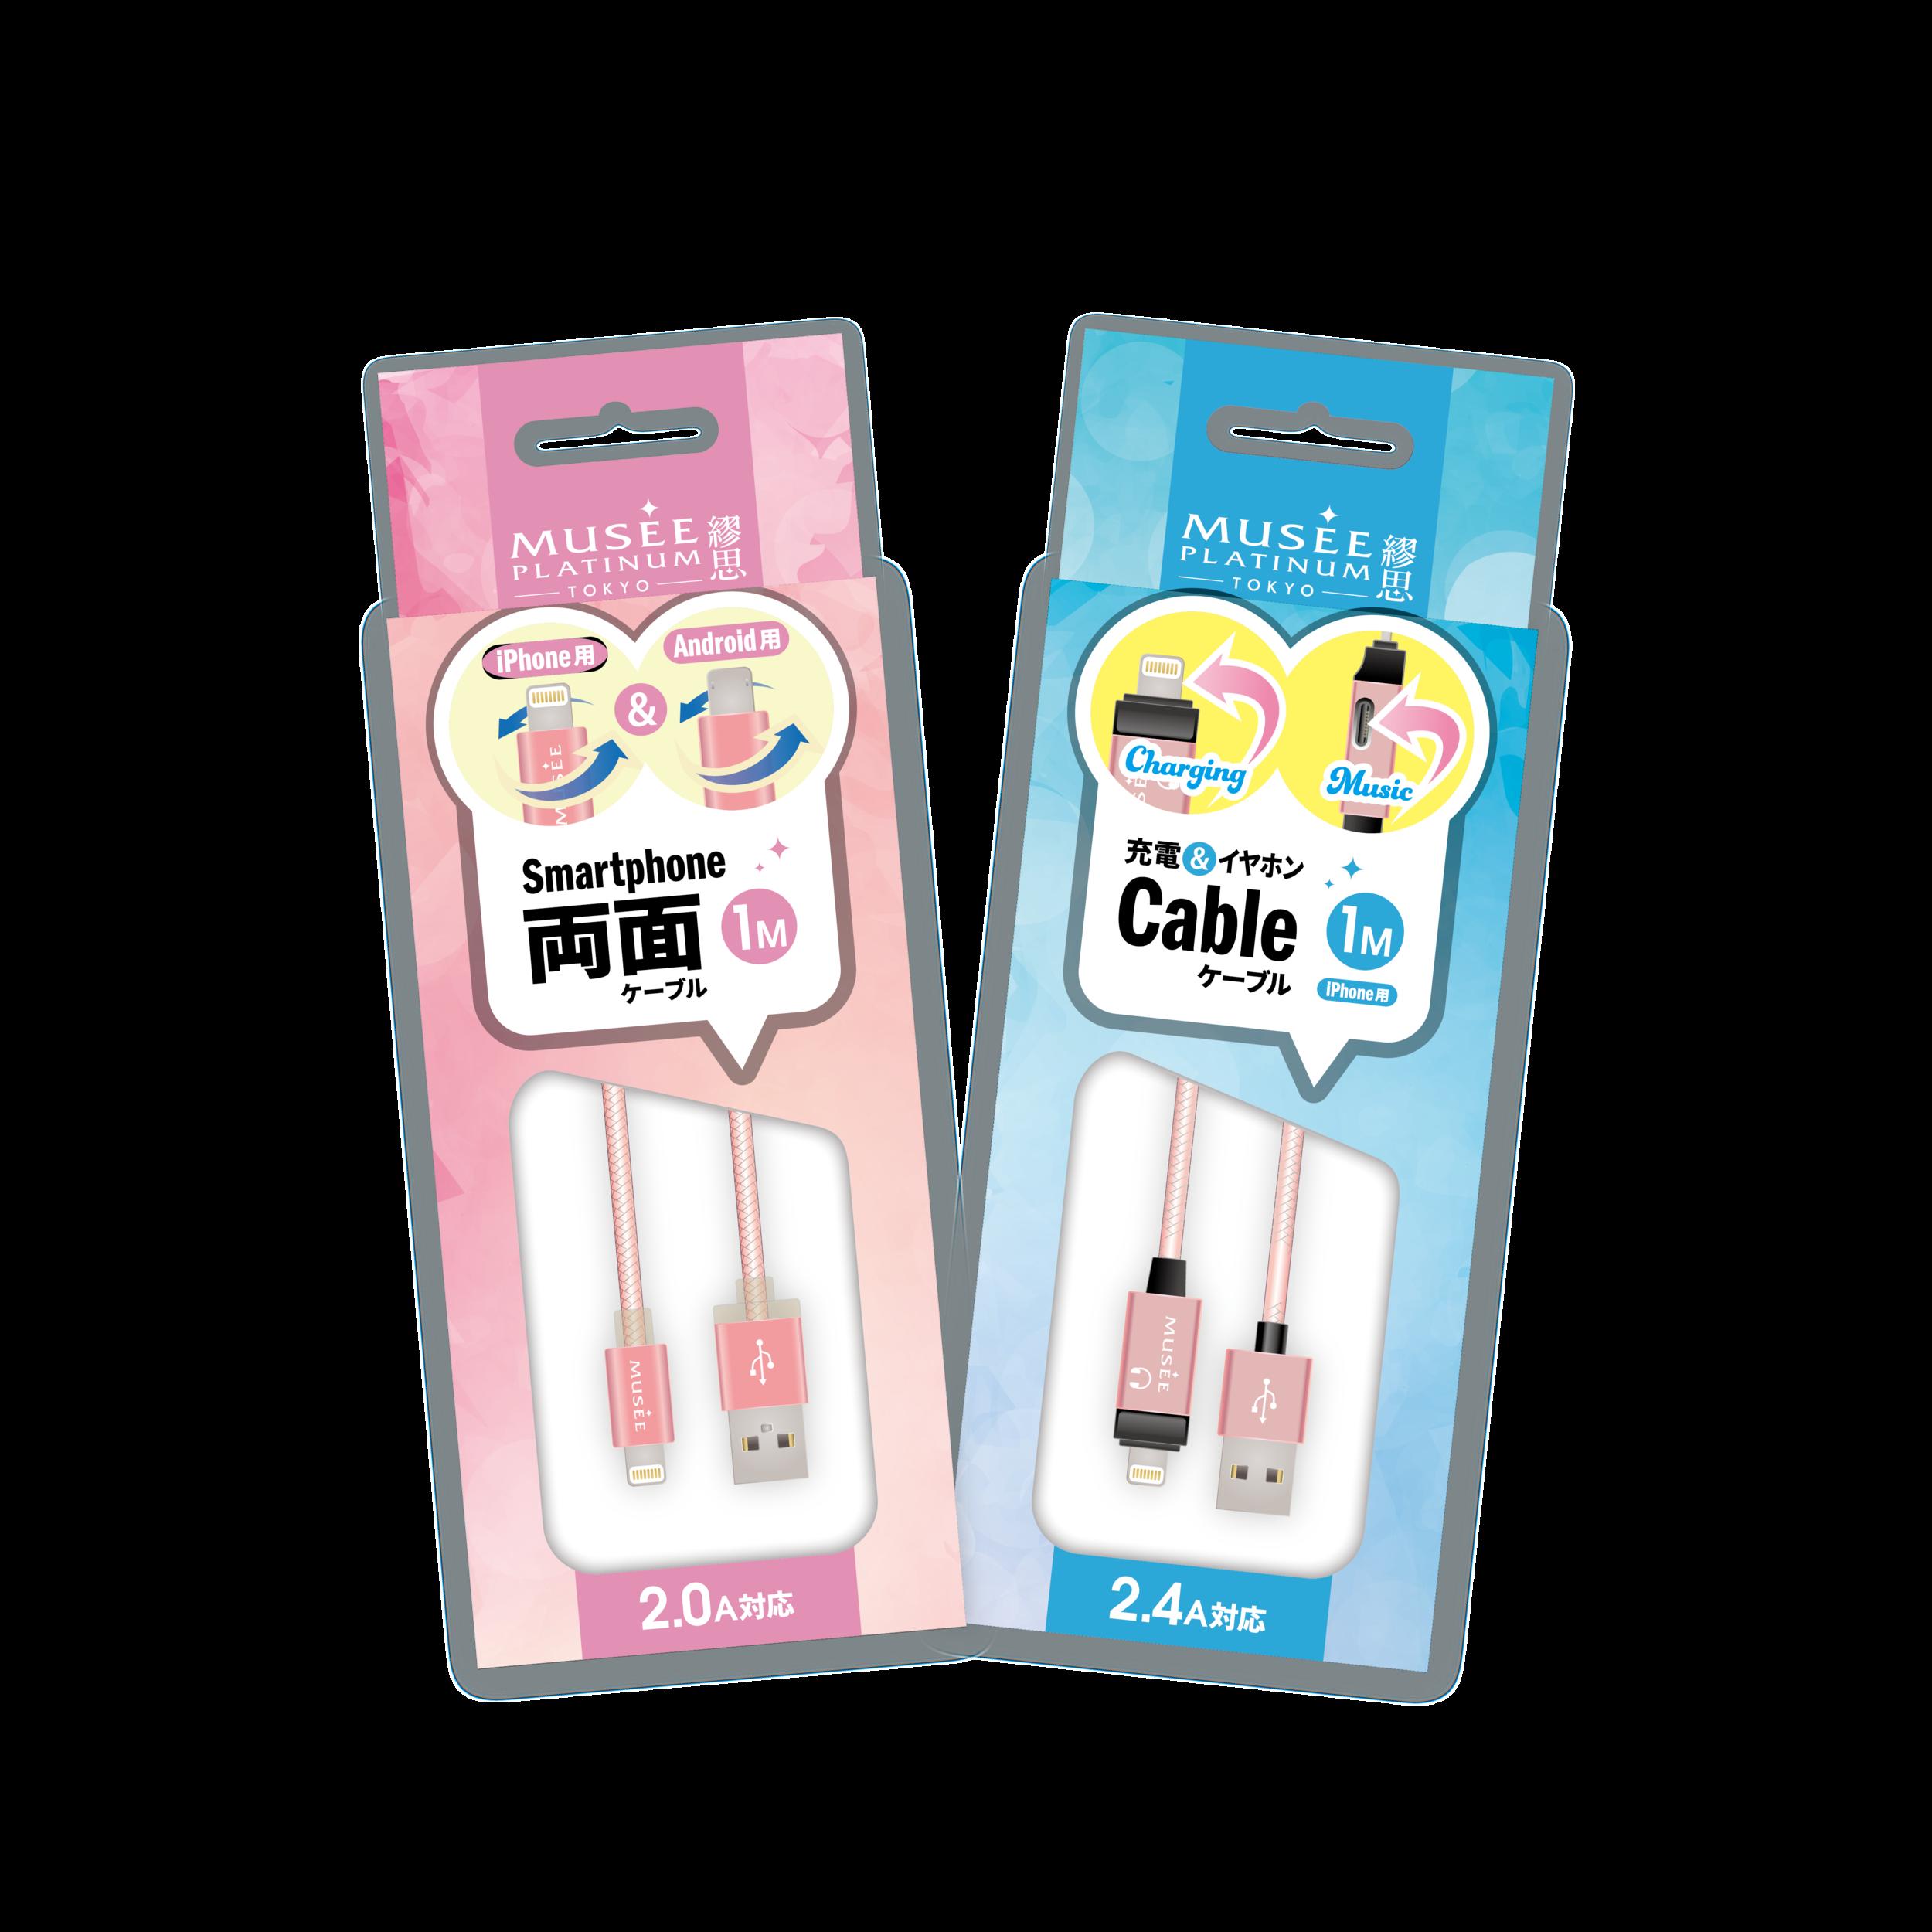 USB Cable mockup_工作區域 1.png